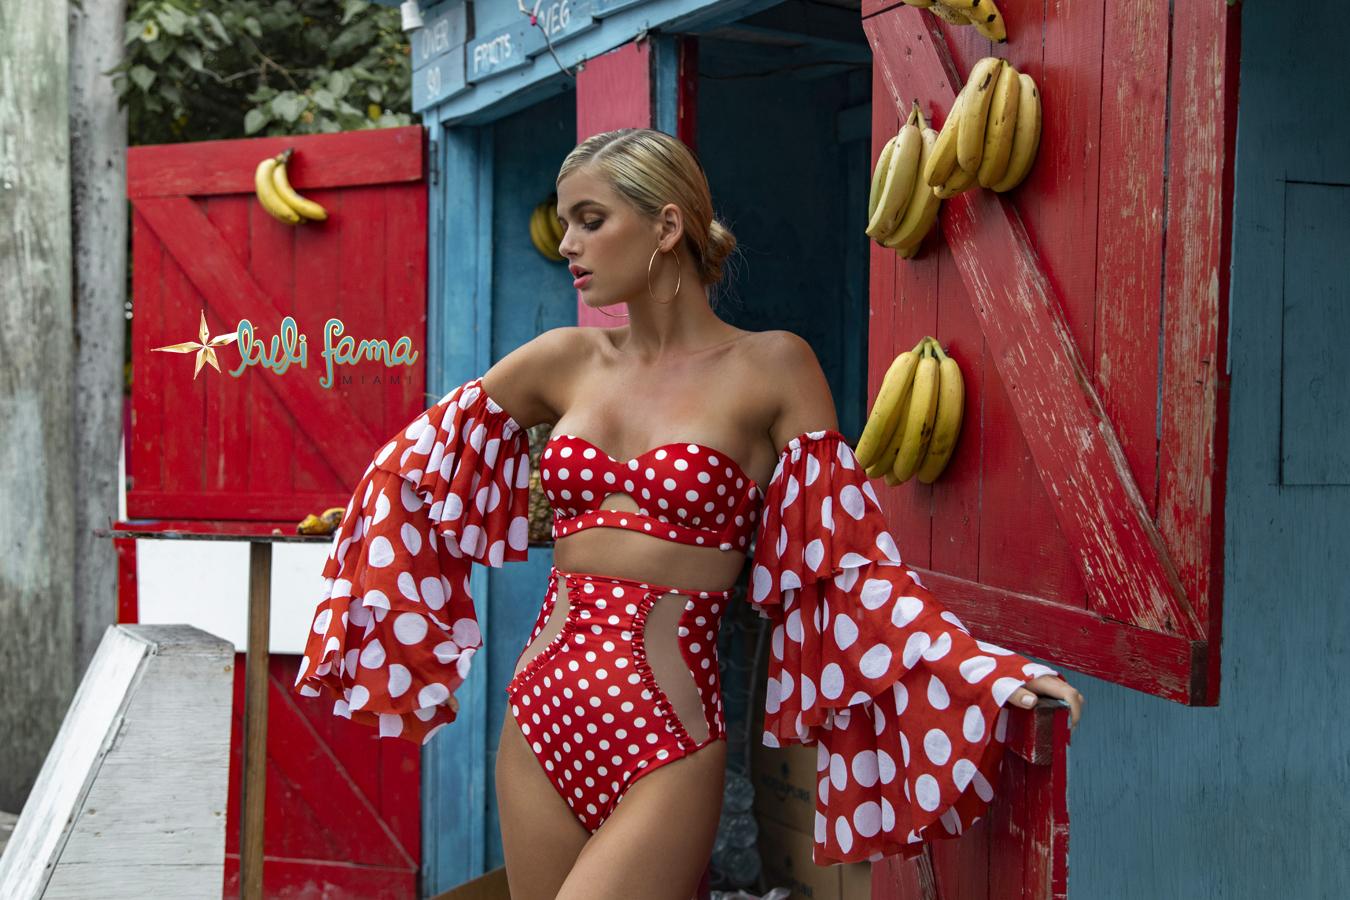 Luli Fama at Butterflies and Bikinis Macarena Peekaboo Underwire Bandeau and High Waist Corset Bottom